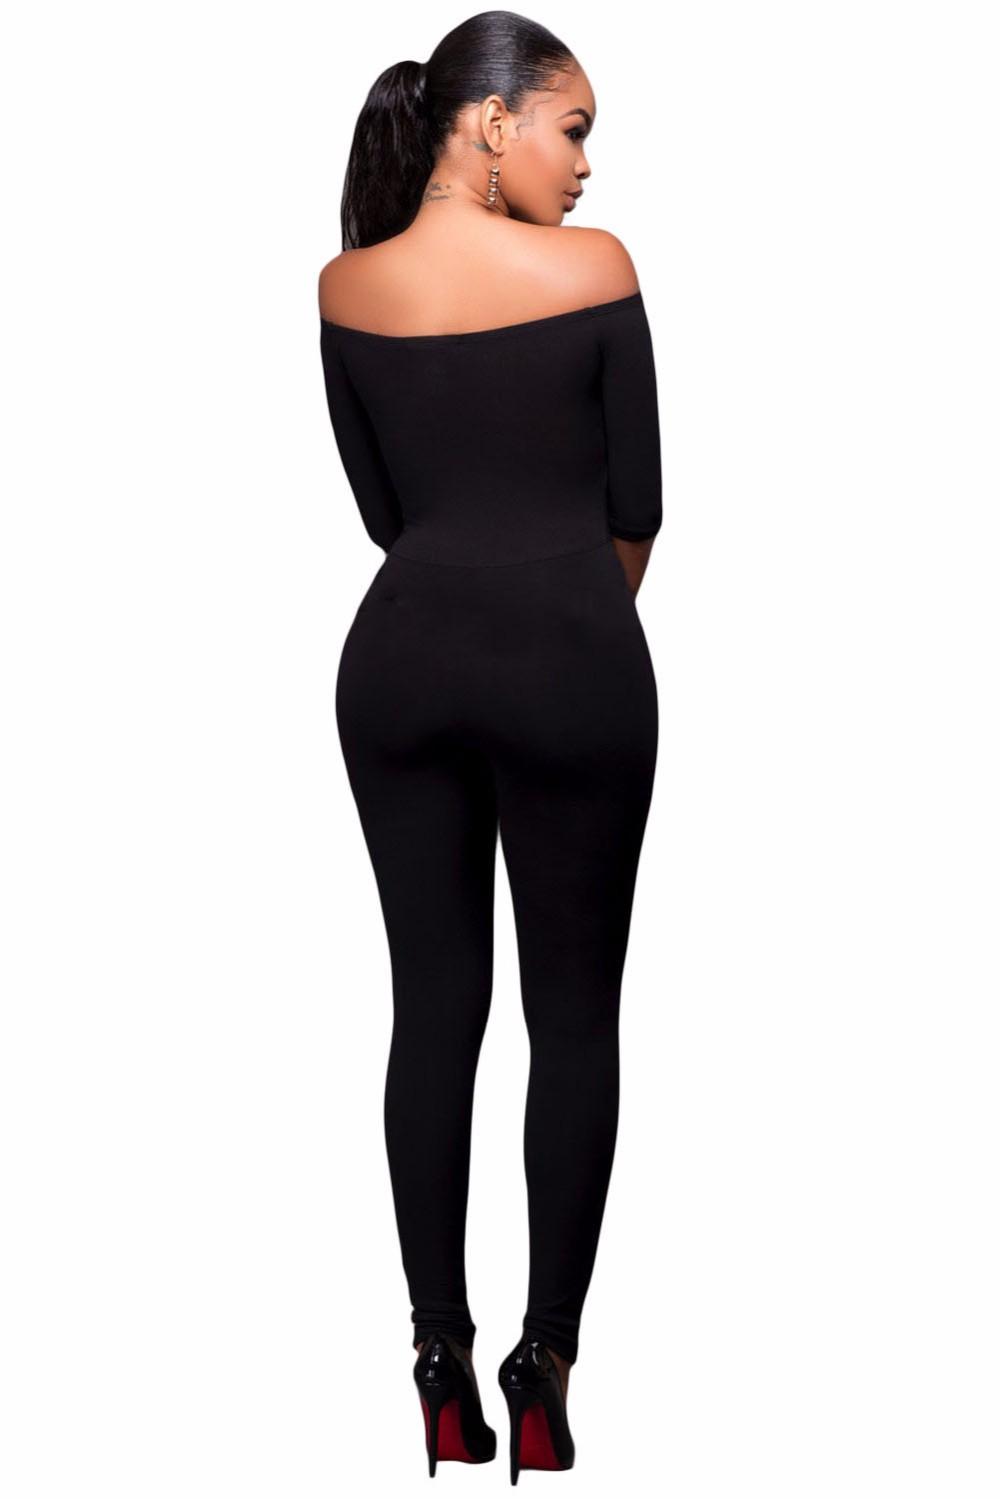 Black-Bardot-Neckline-Fashion-Jumpsuit-LC64193-2-3